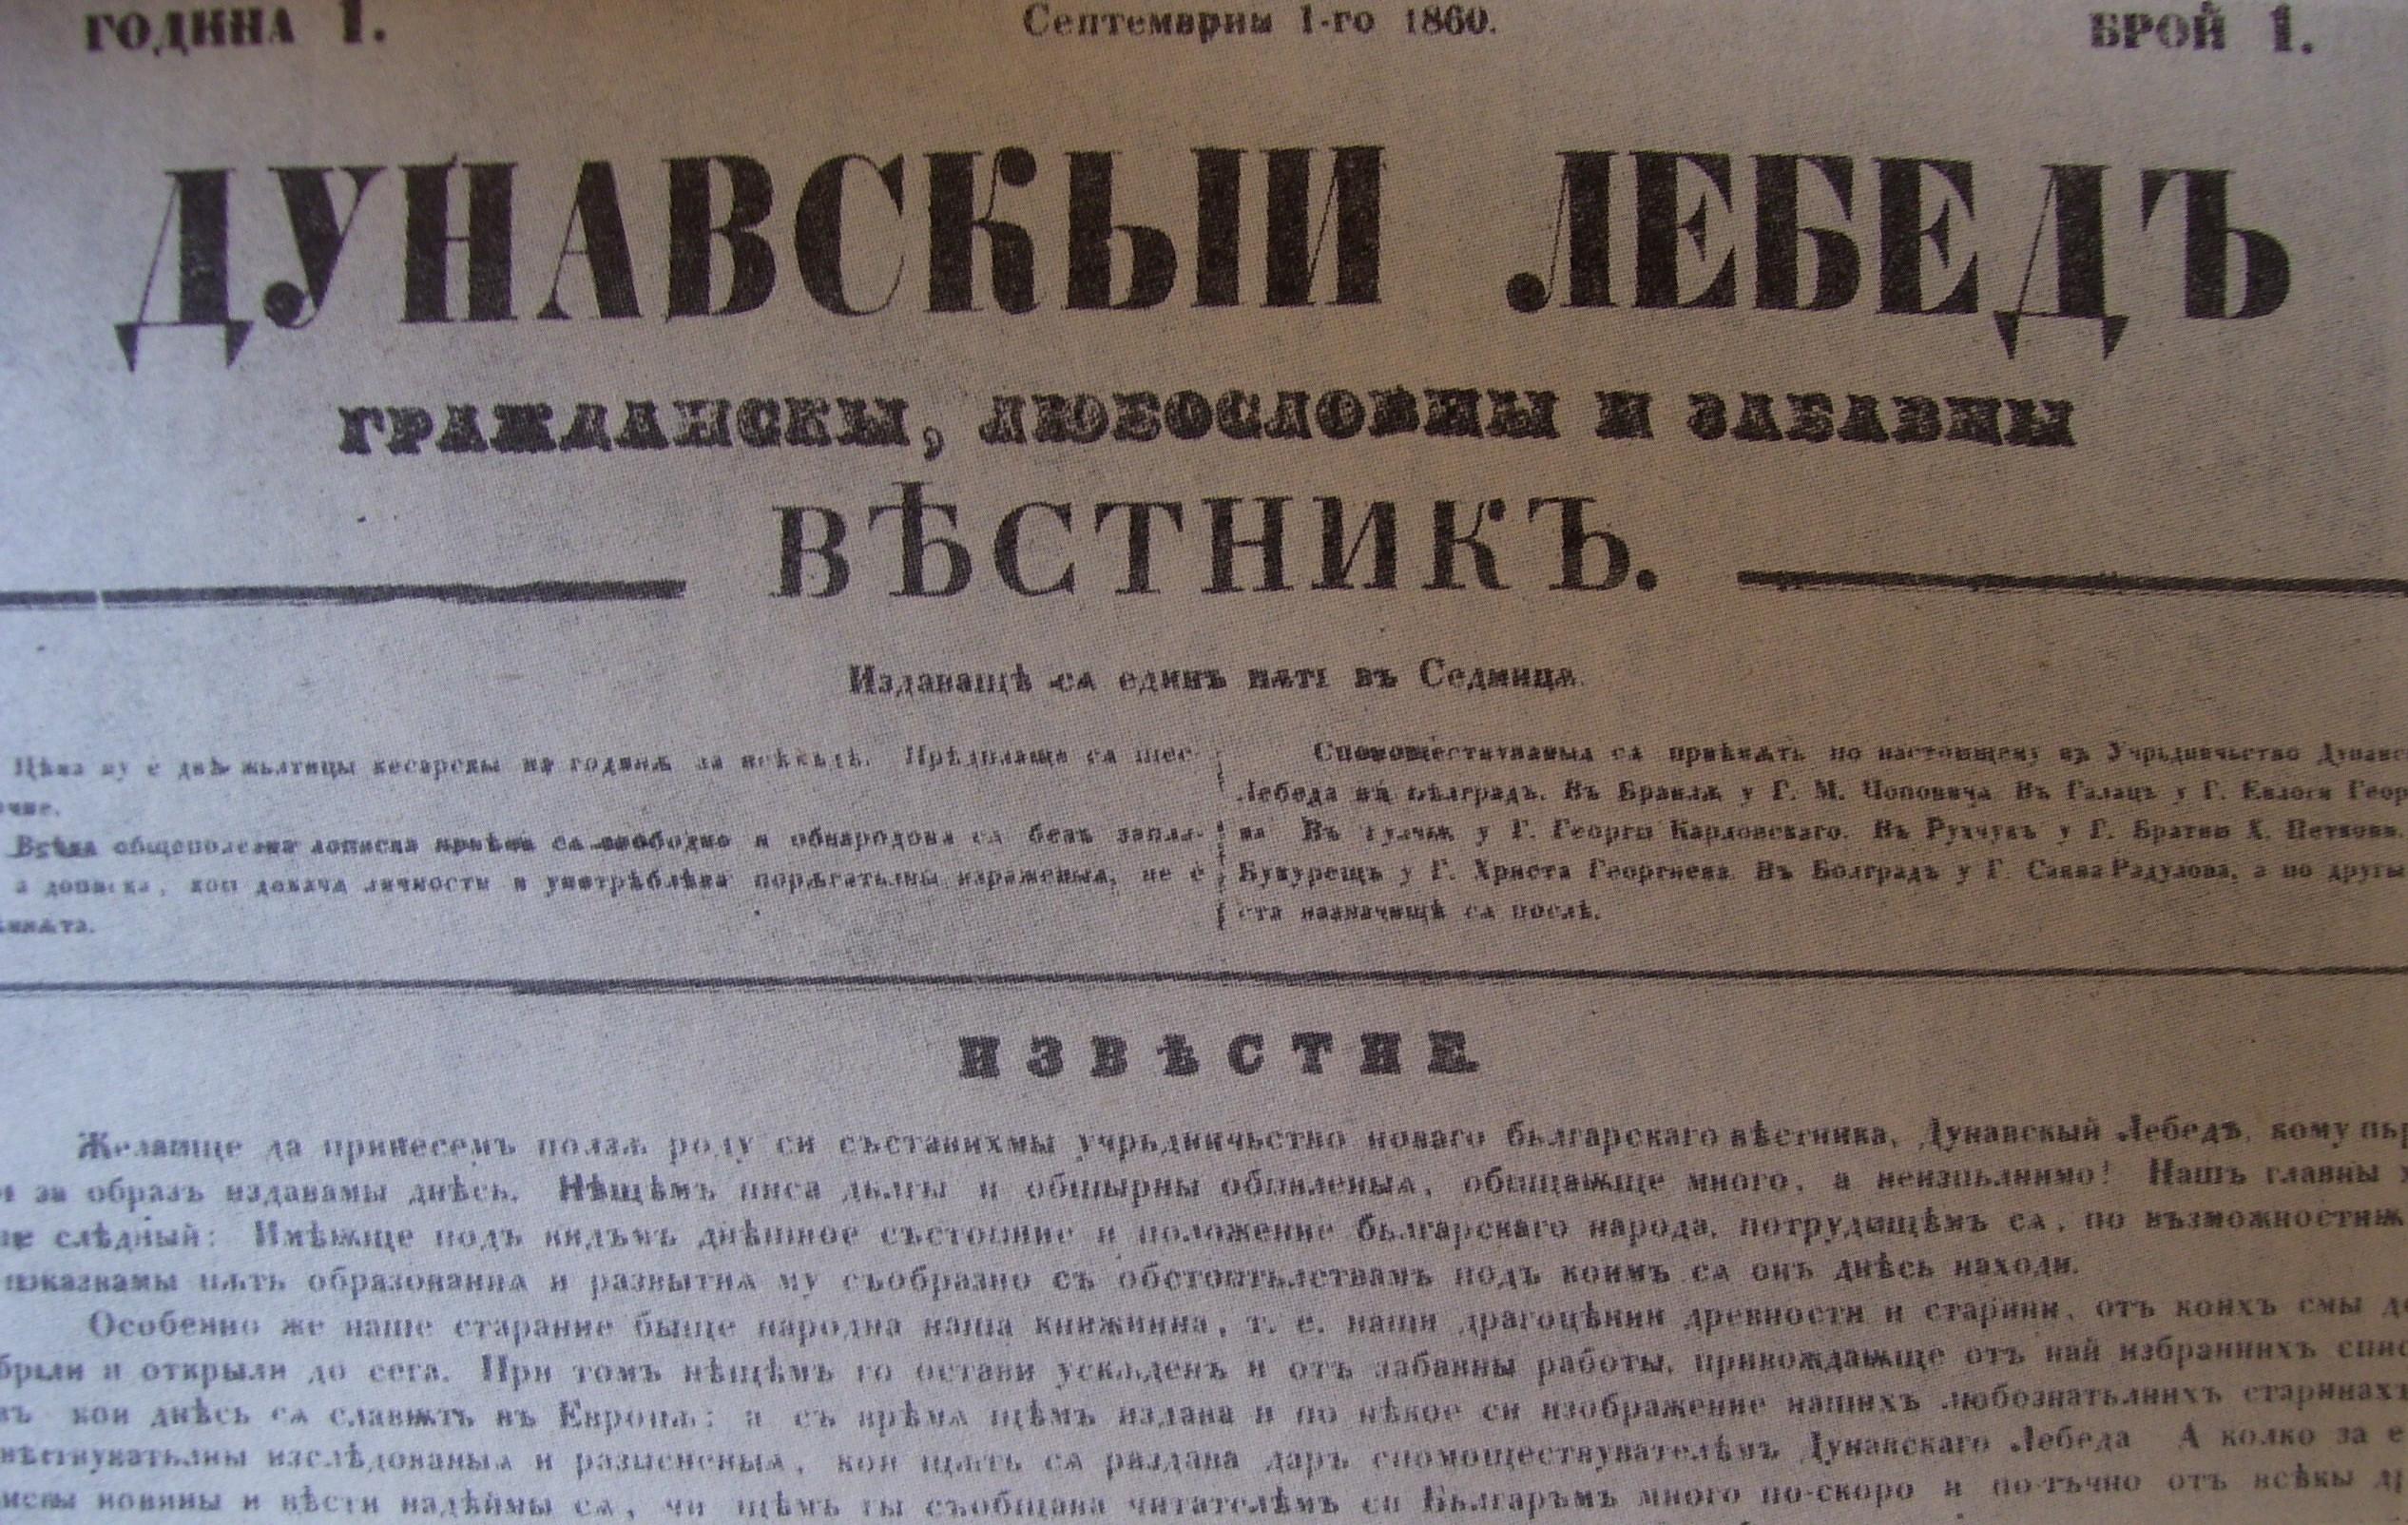 https://upload.wikimedia.org/wikipedia/commons/6/63/Dunavskiy-Lebed-Issue-1.jpg